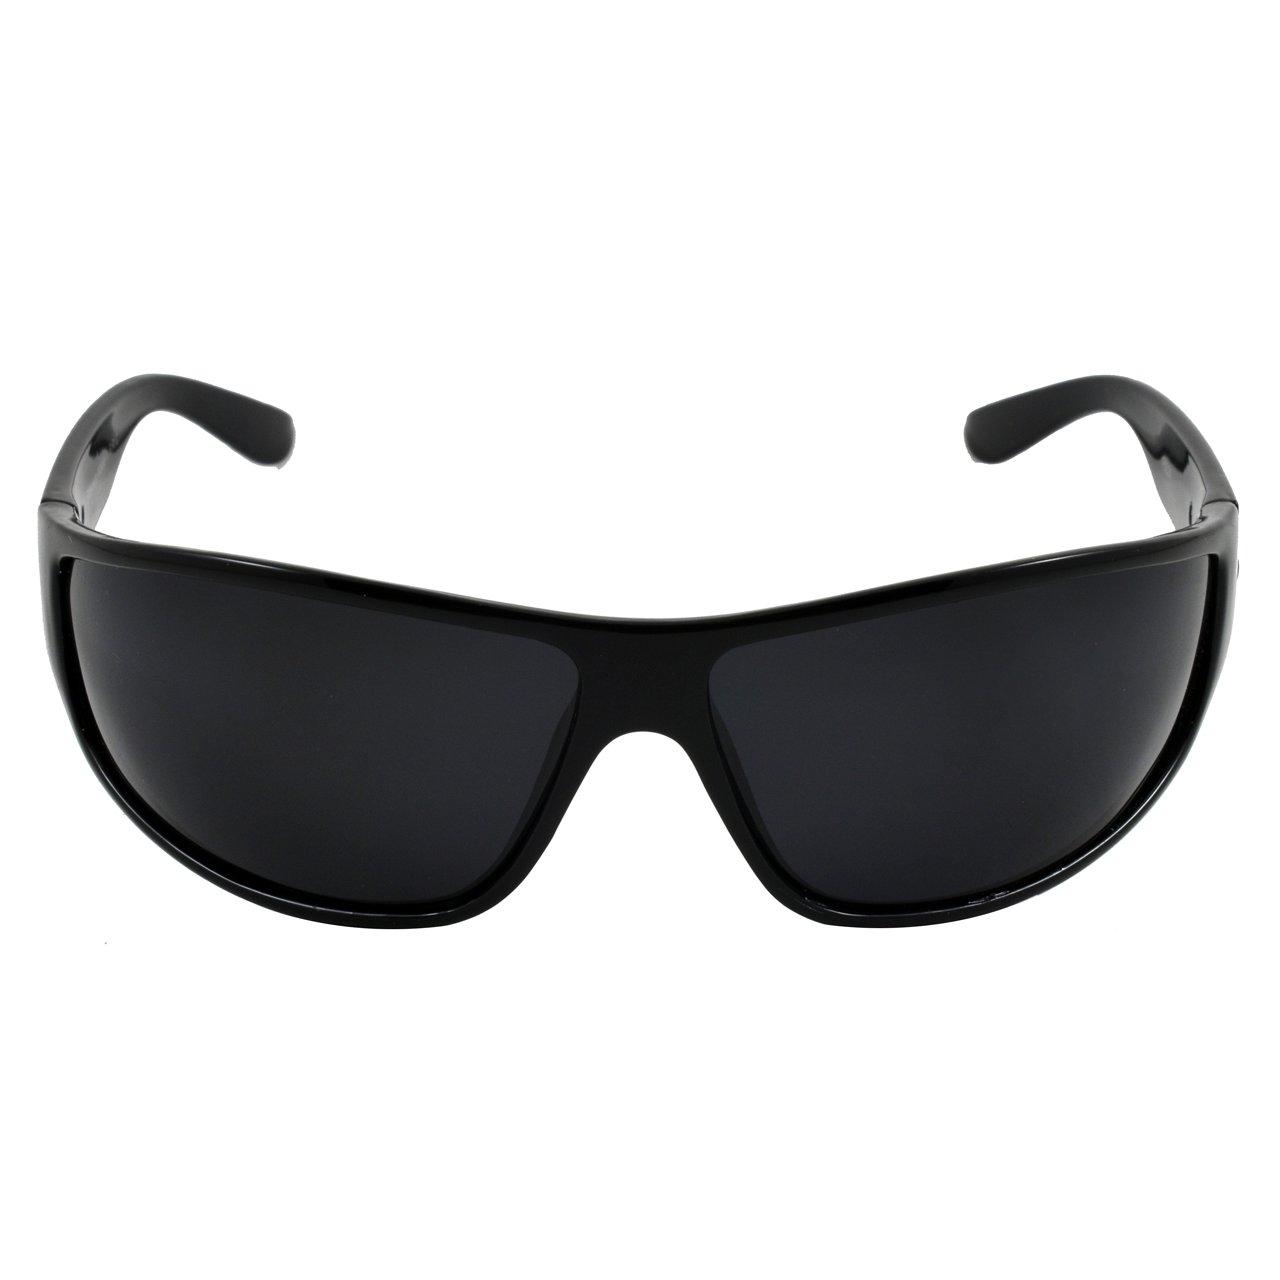 عینک آفتابی الدرادو مدل Full Frame True Black